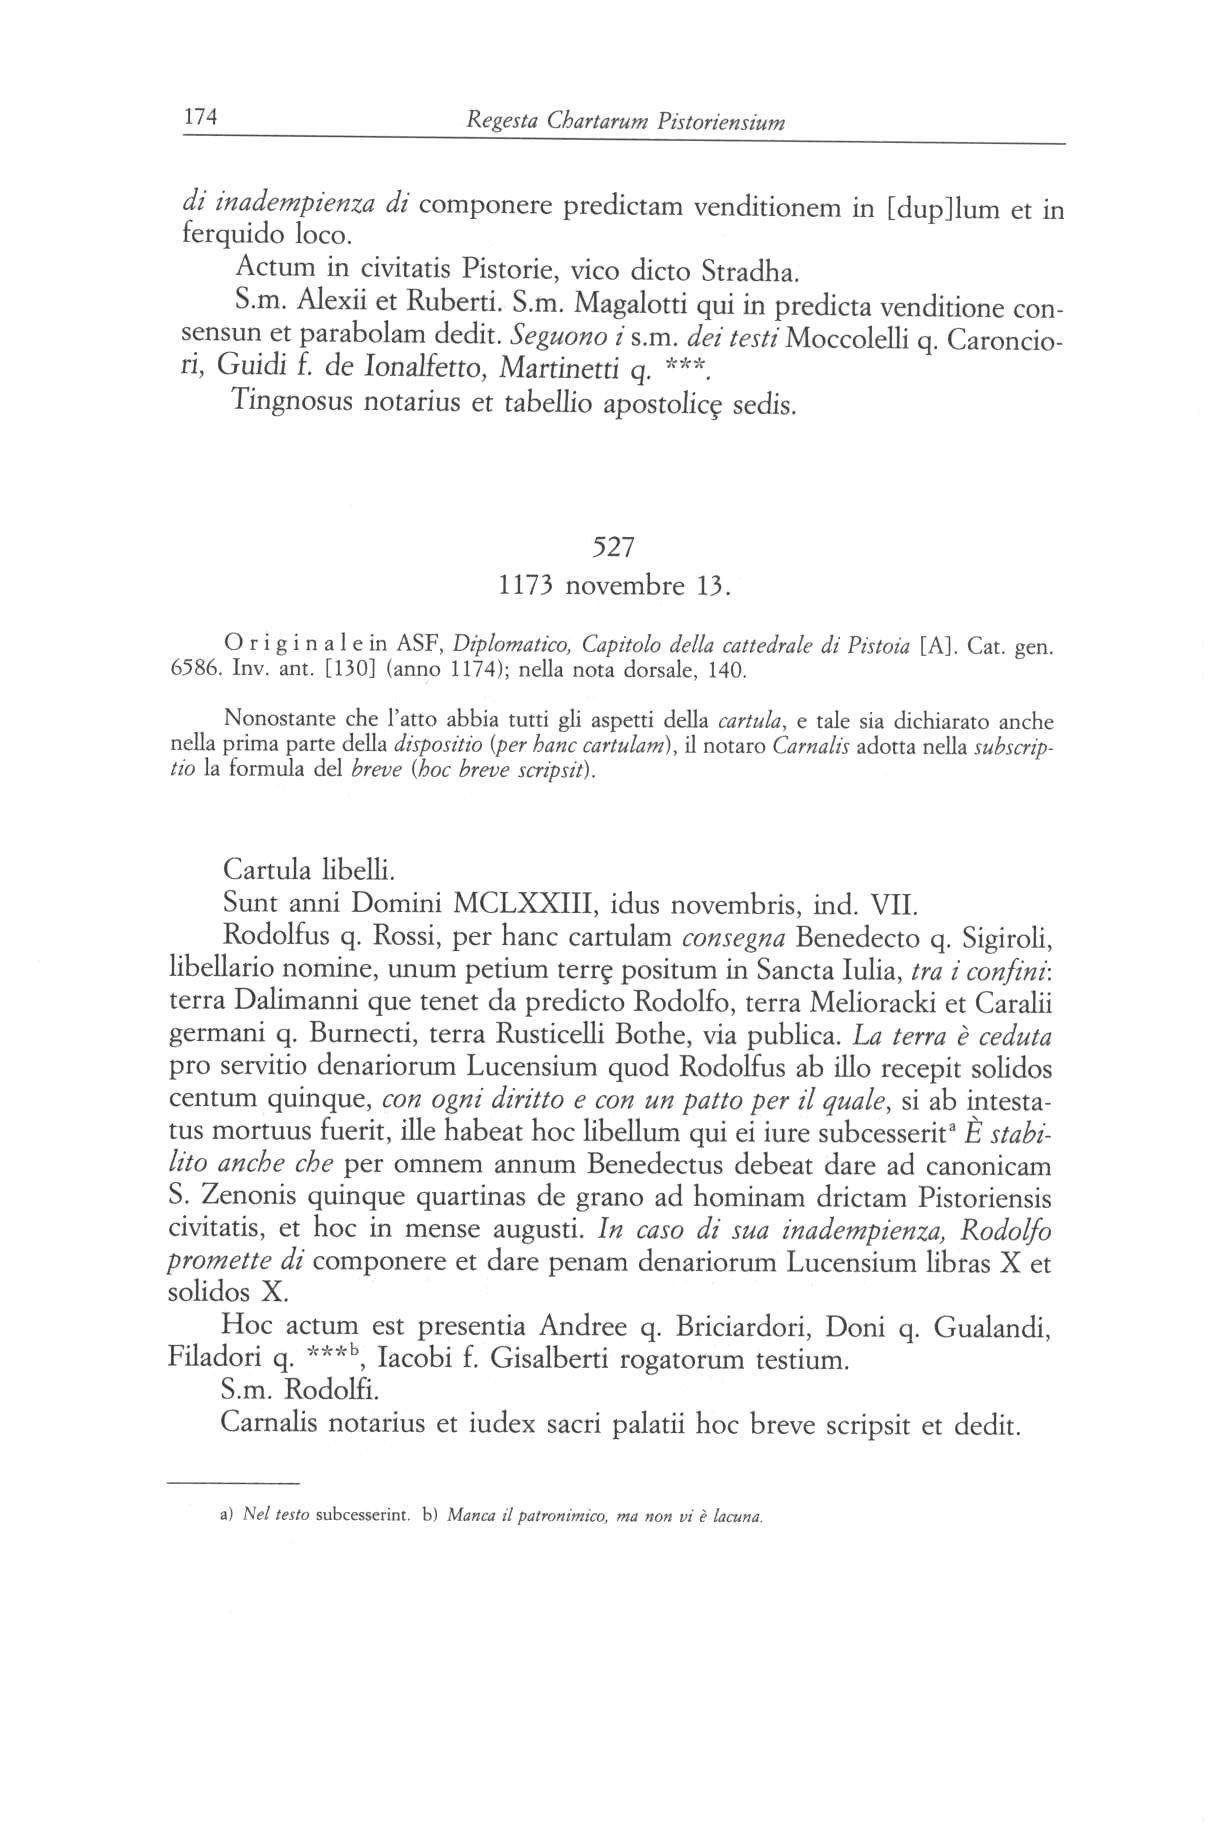 Canonica S. Zenone XII 0174.jpg